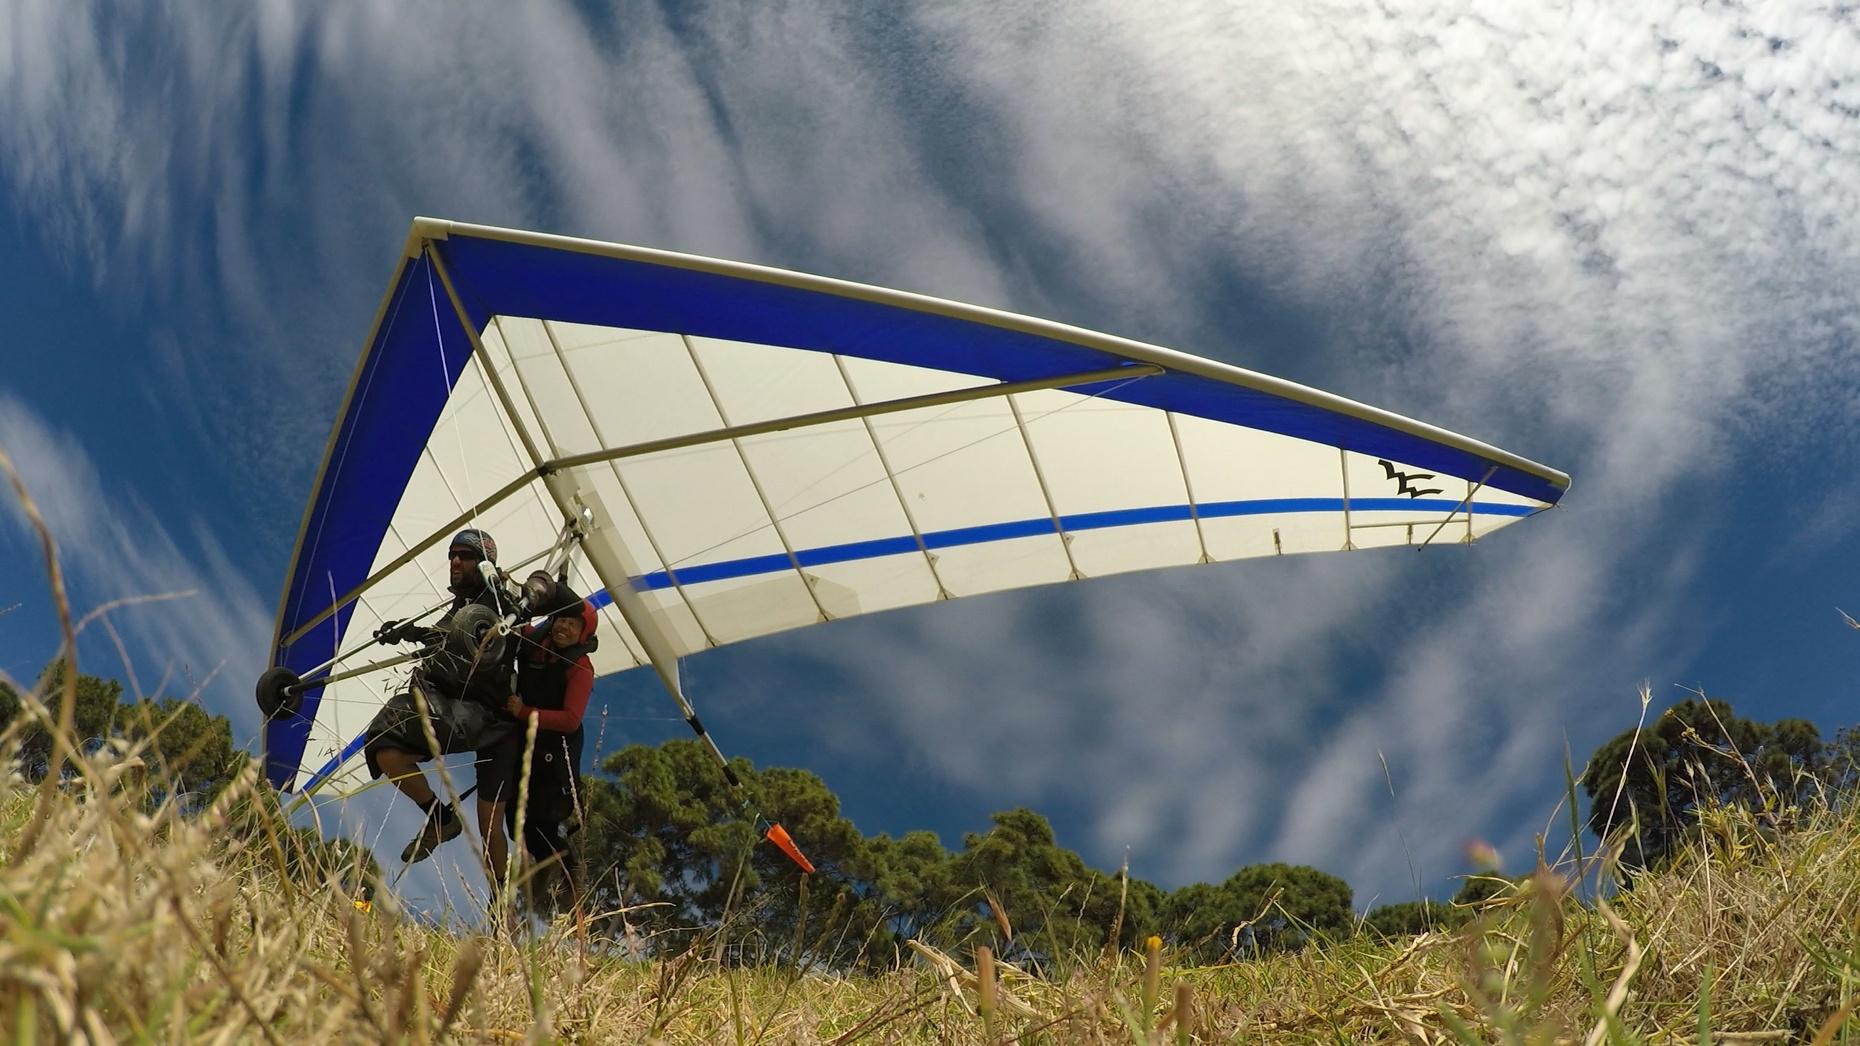 Valle de Bravo Hang Gliding Adventure